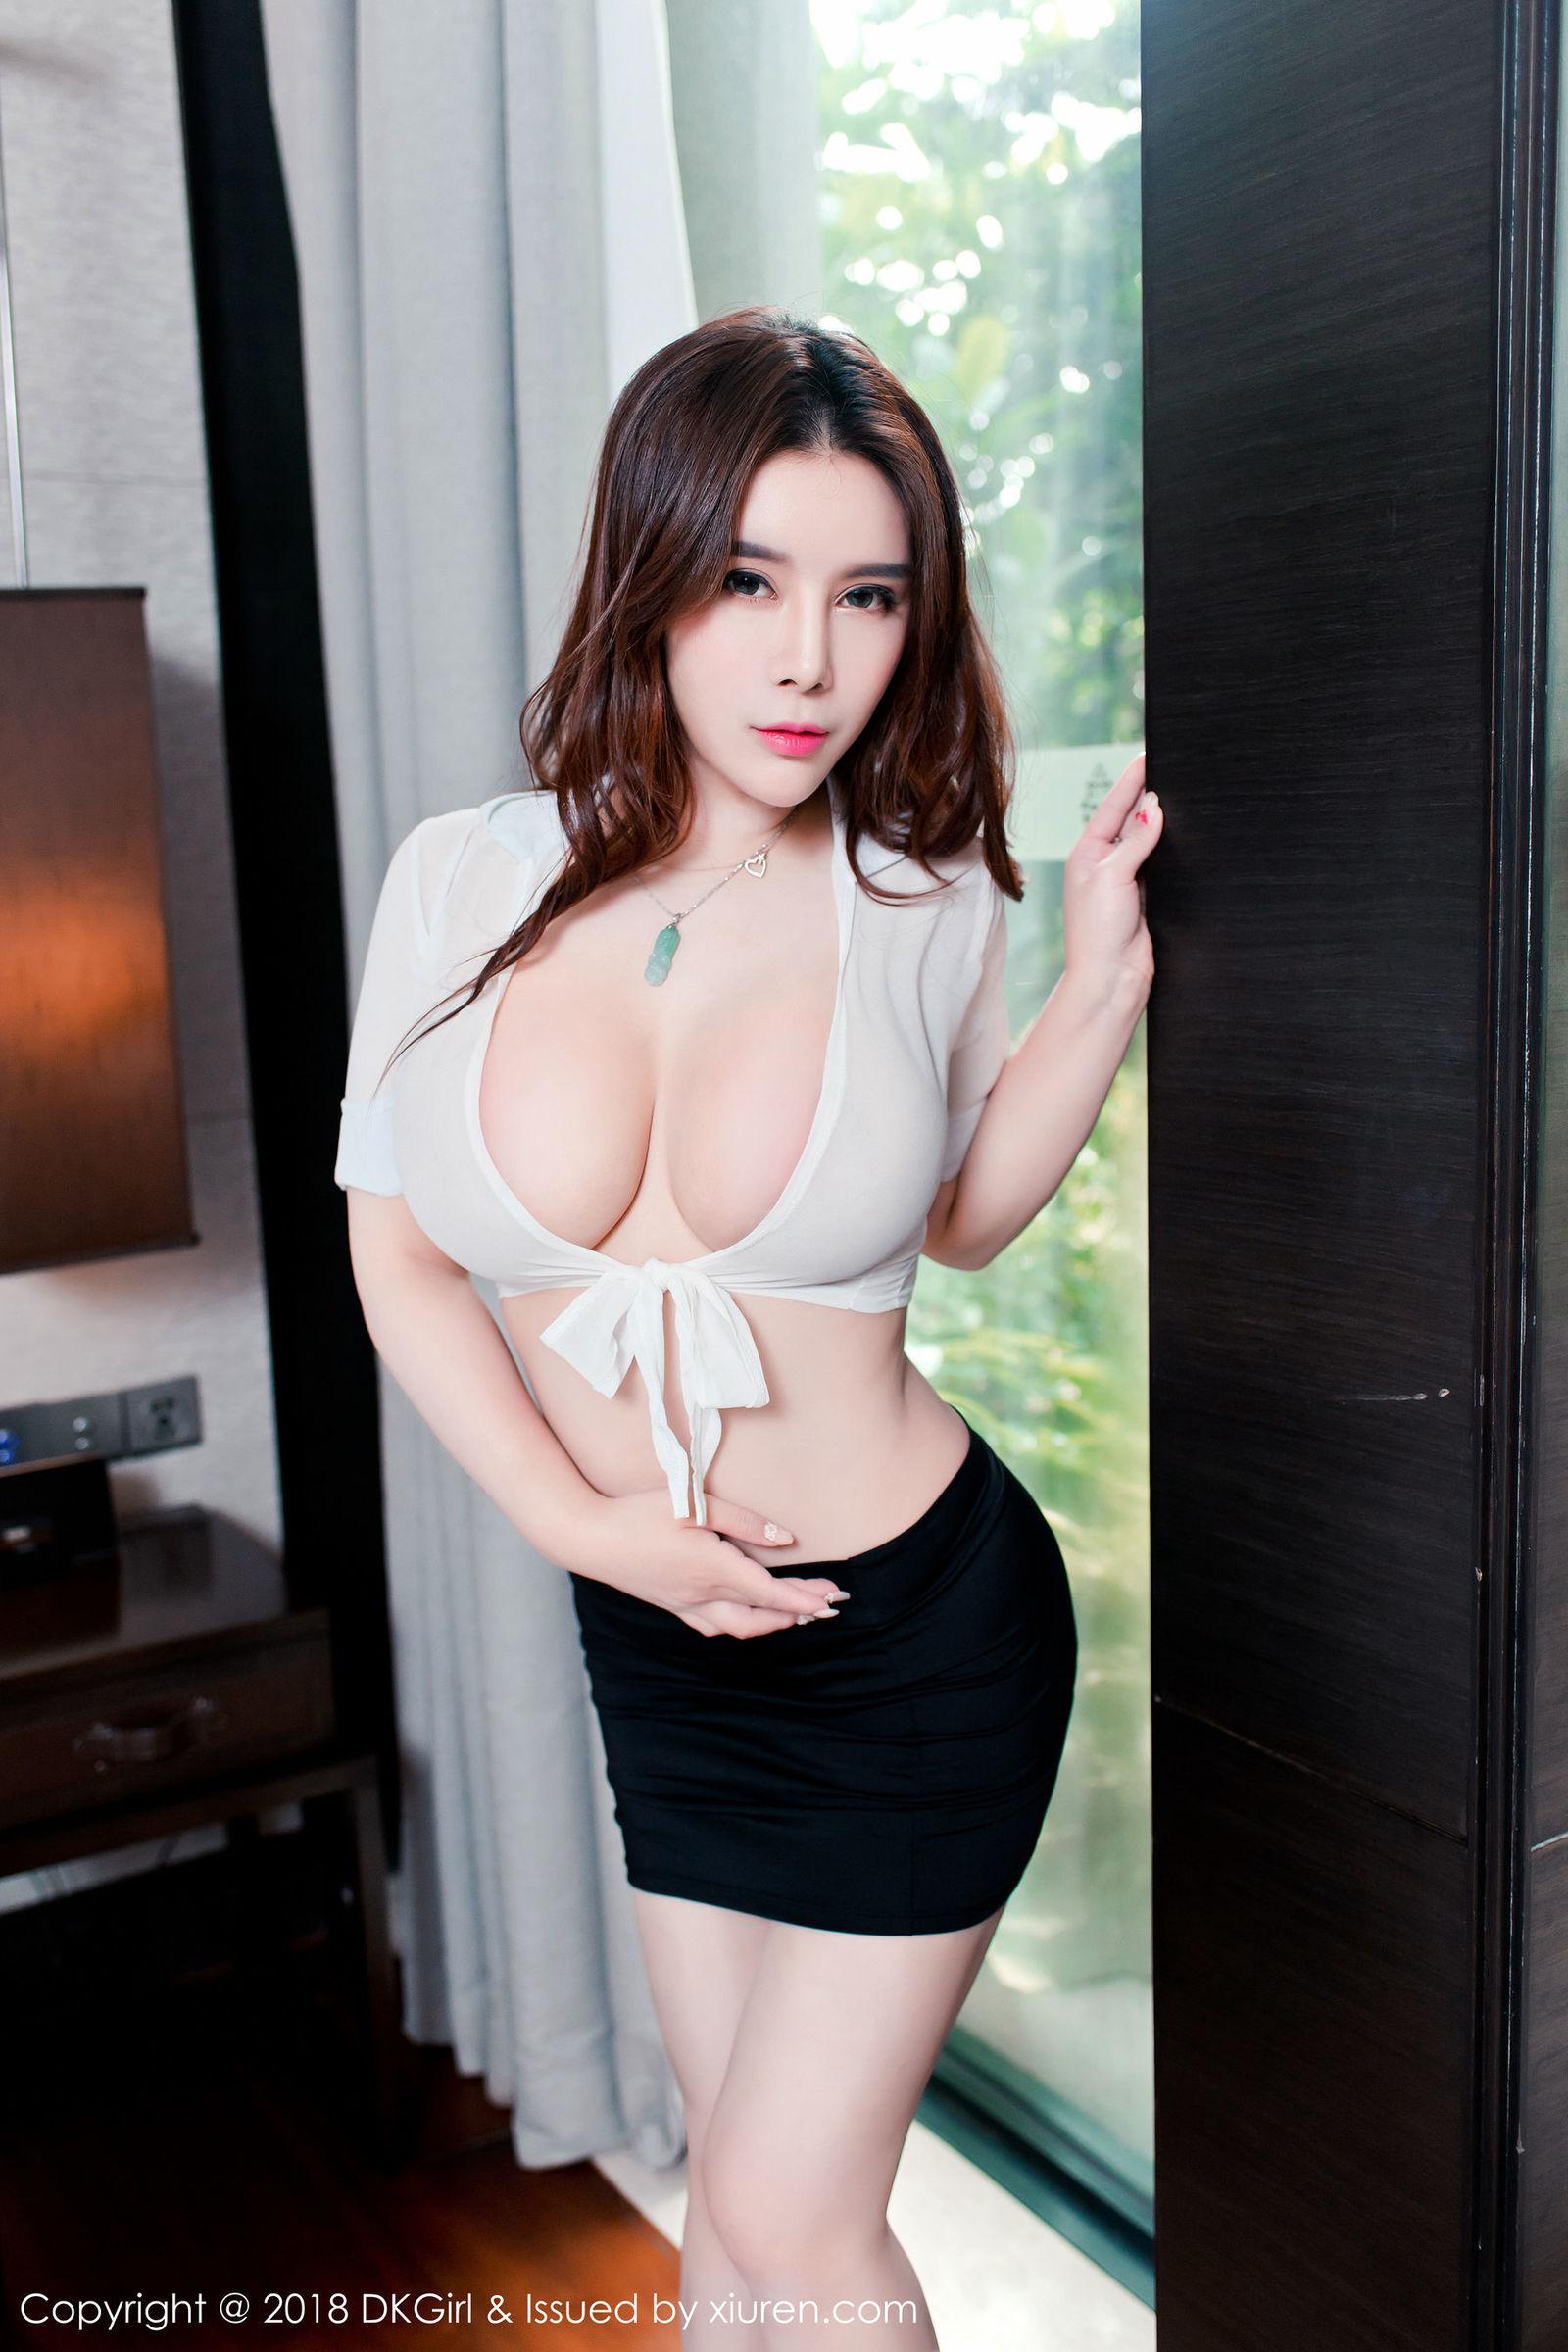 [DKGirl御女郎] Vol.083 雪千寻 - 成熟少妇,丰乳肥臀